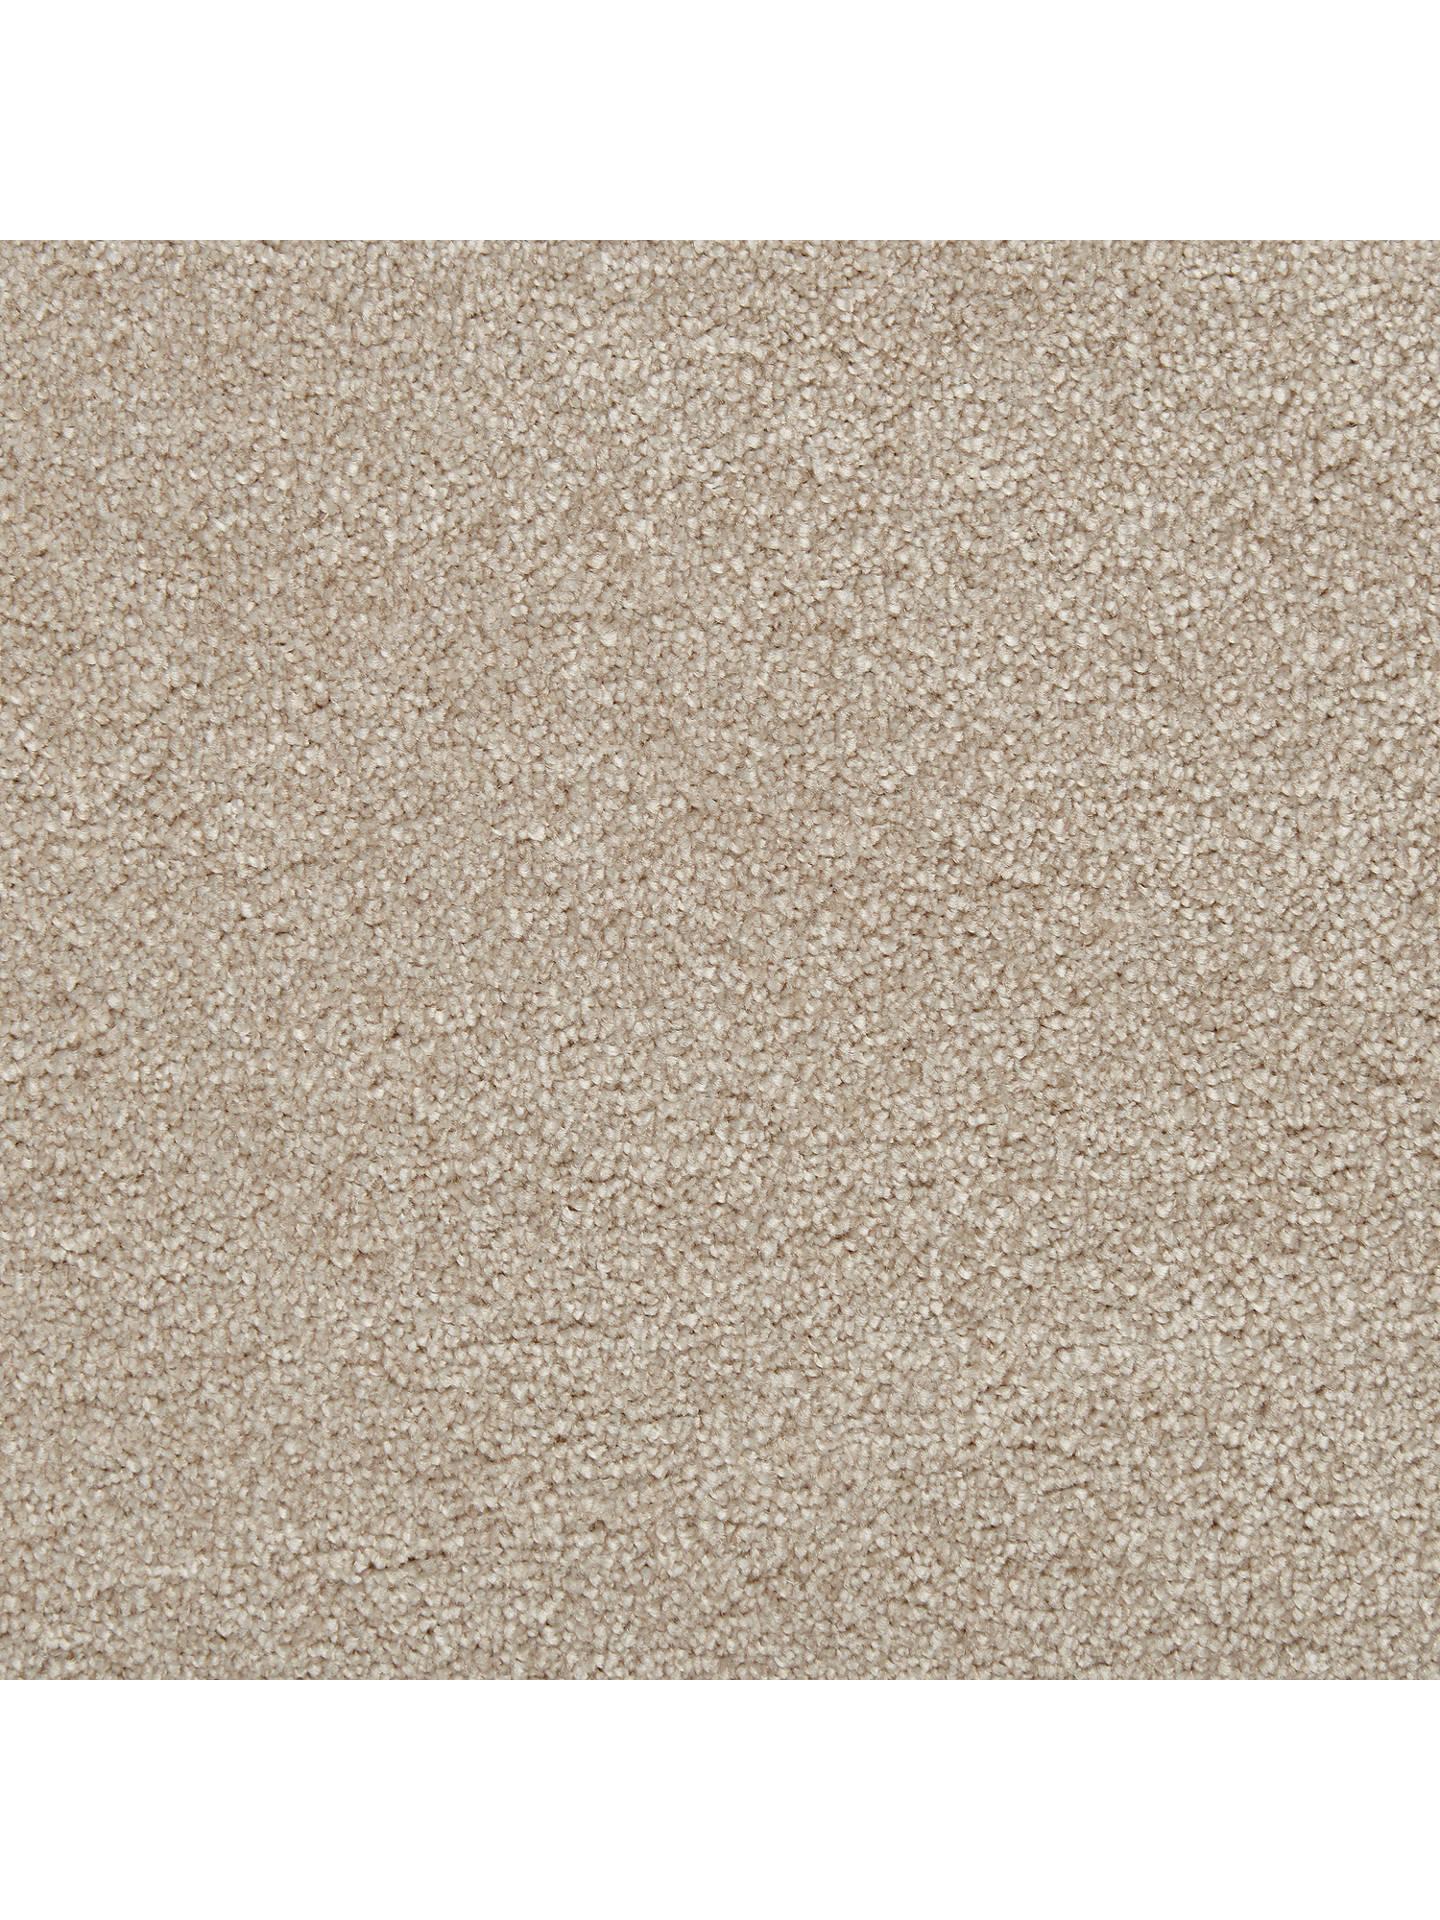 john lewis silken plush twisted pile carpet at john lewis. Black Bedroom Furniture Sets. Home Design Ideas